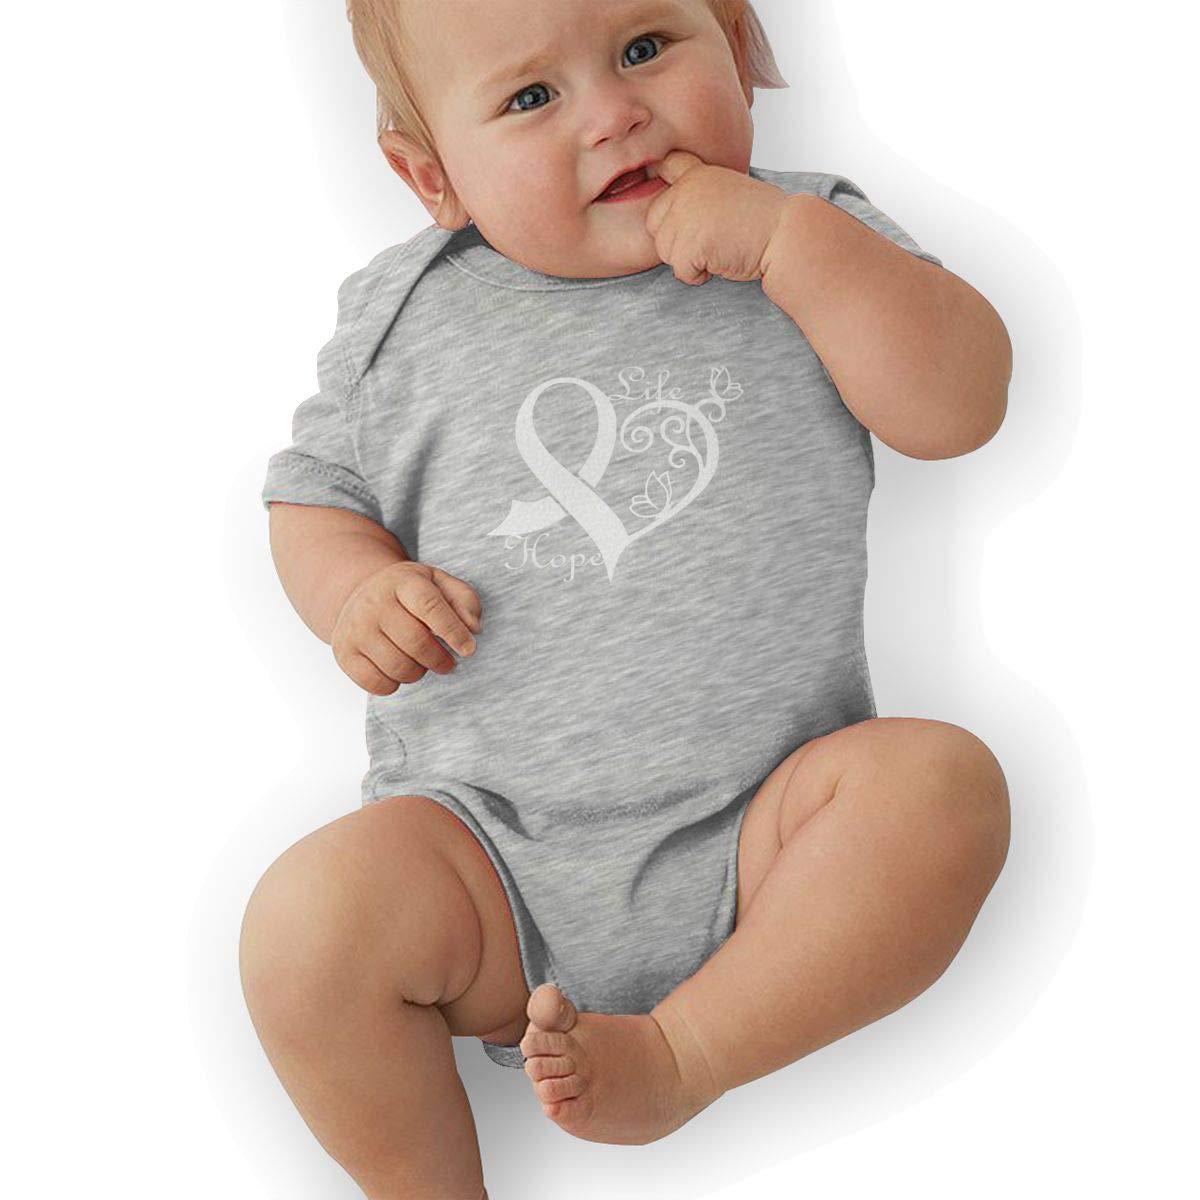 Dfenere Life Hope Graphic Newborn Baby Short Sleeve Bodysuit Romper Infant Summer Clothing Black